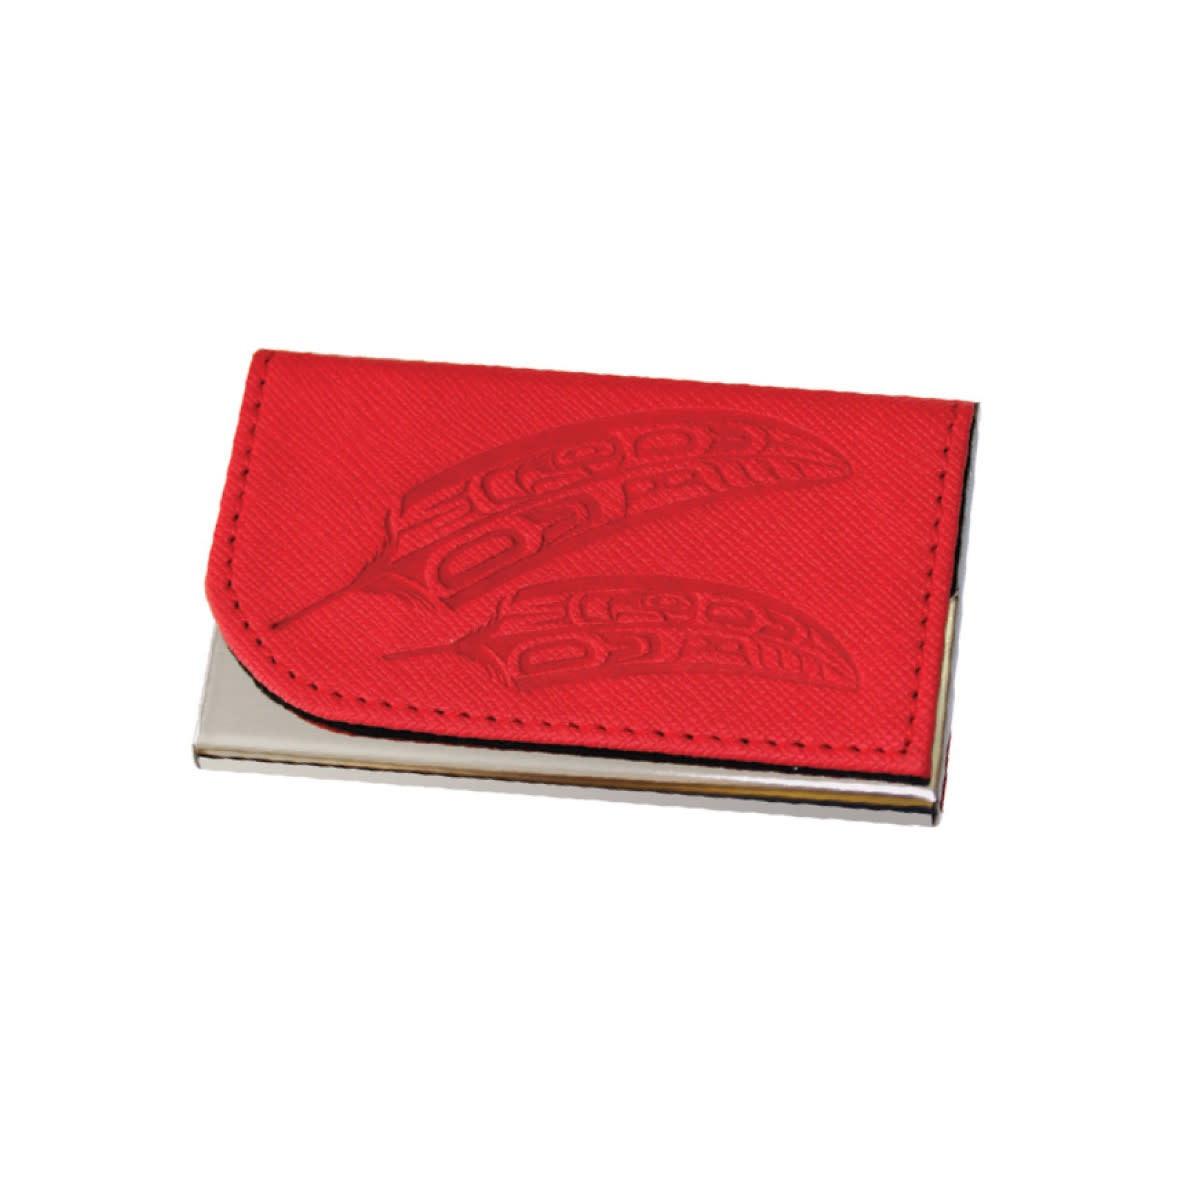 Business Card Holder-2